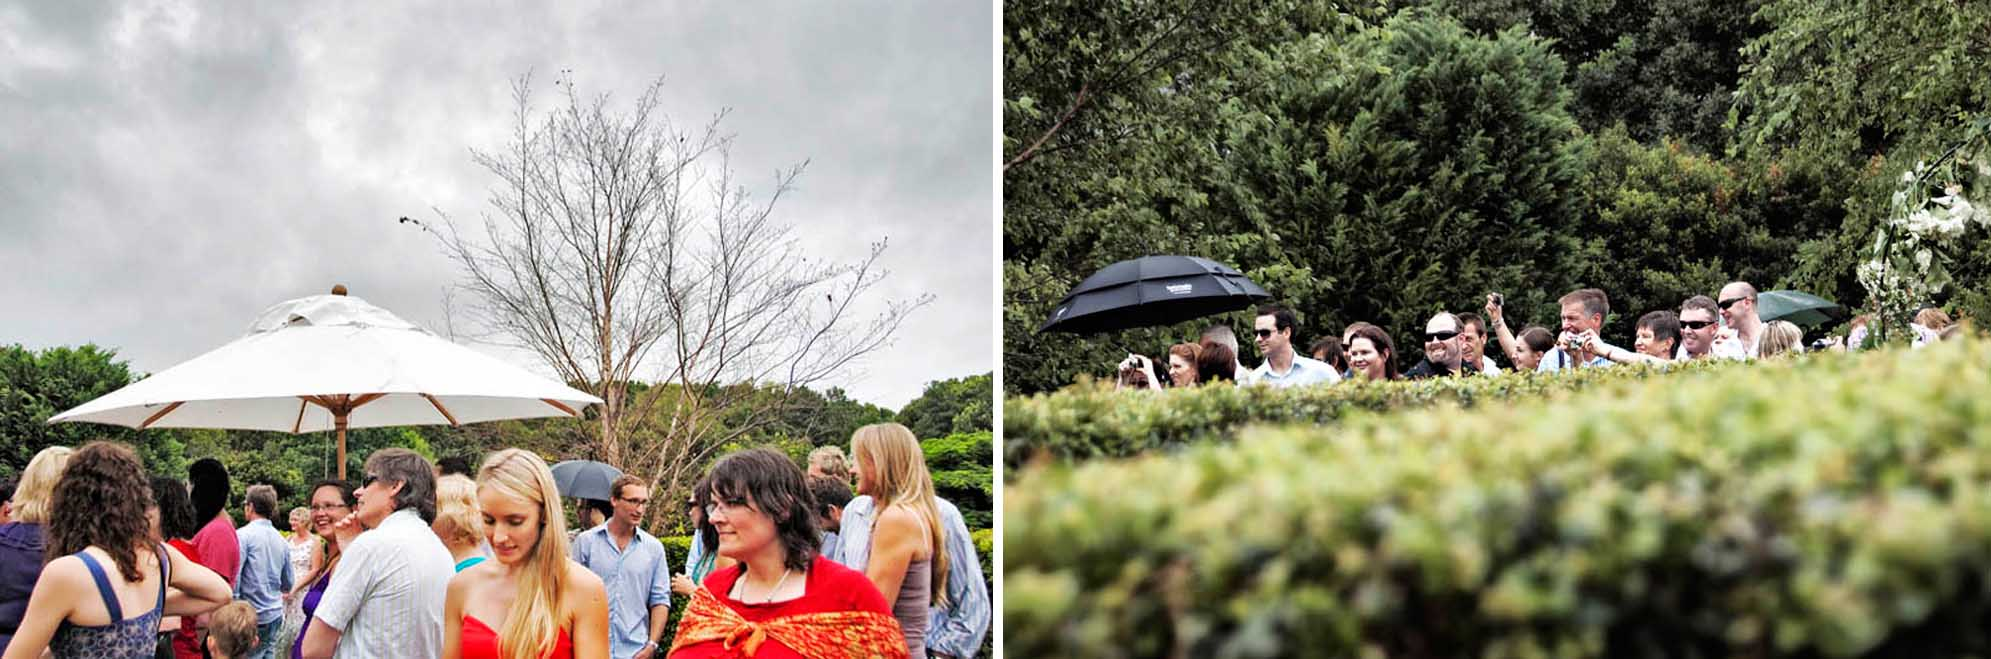 Rainy Wedding Photography_1.jpg